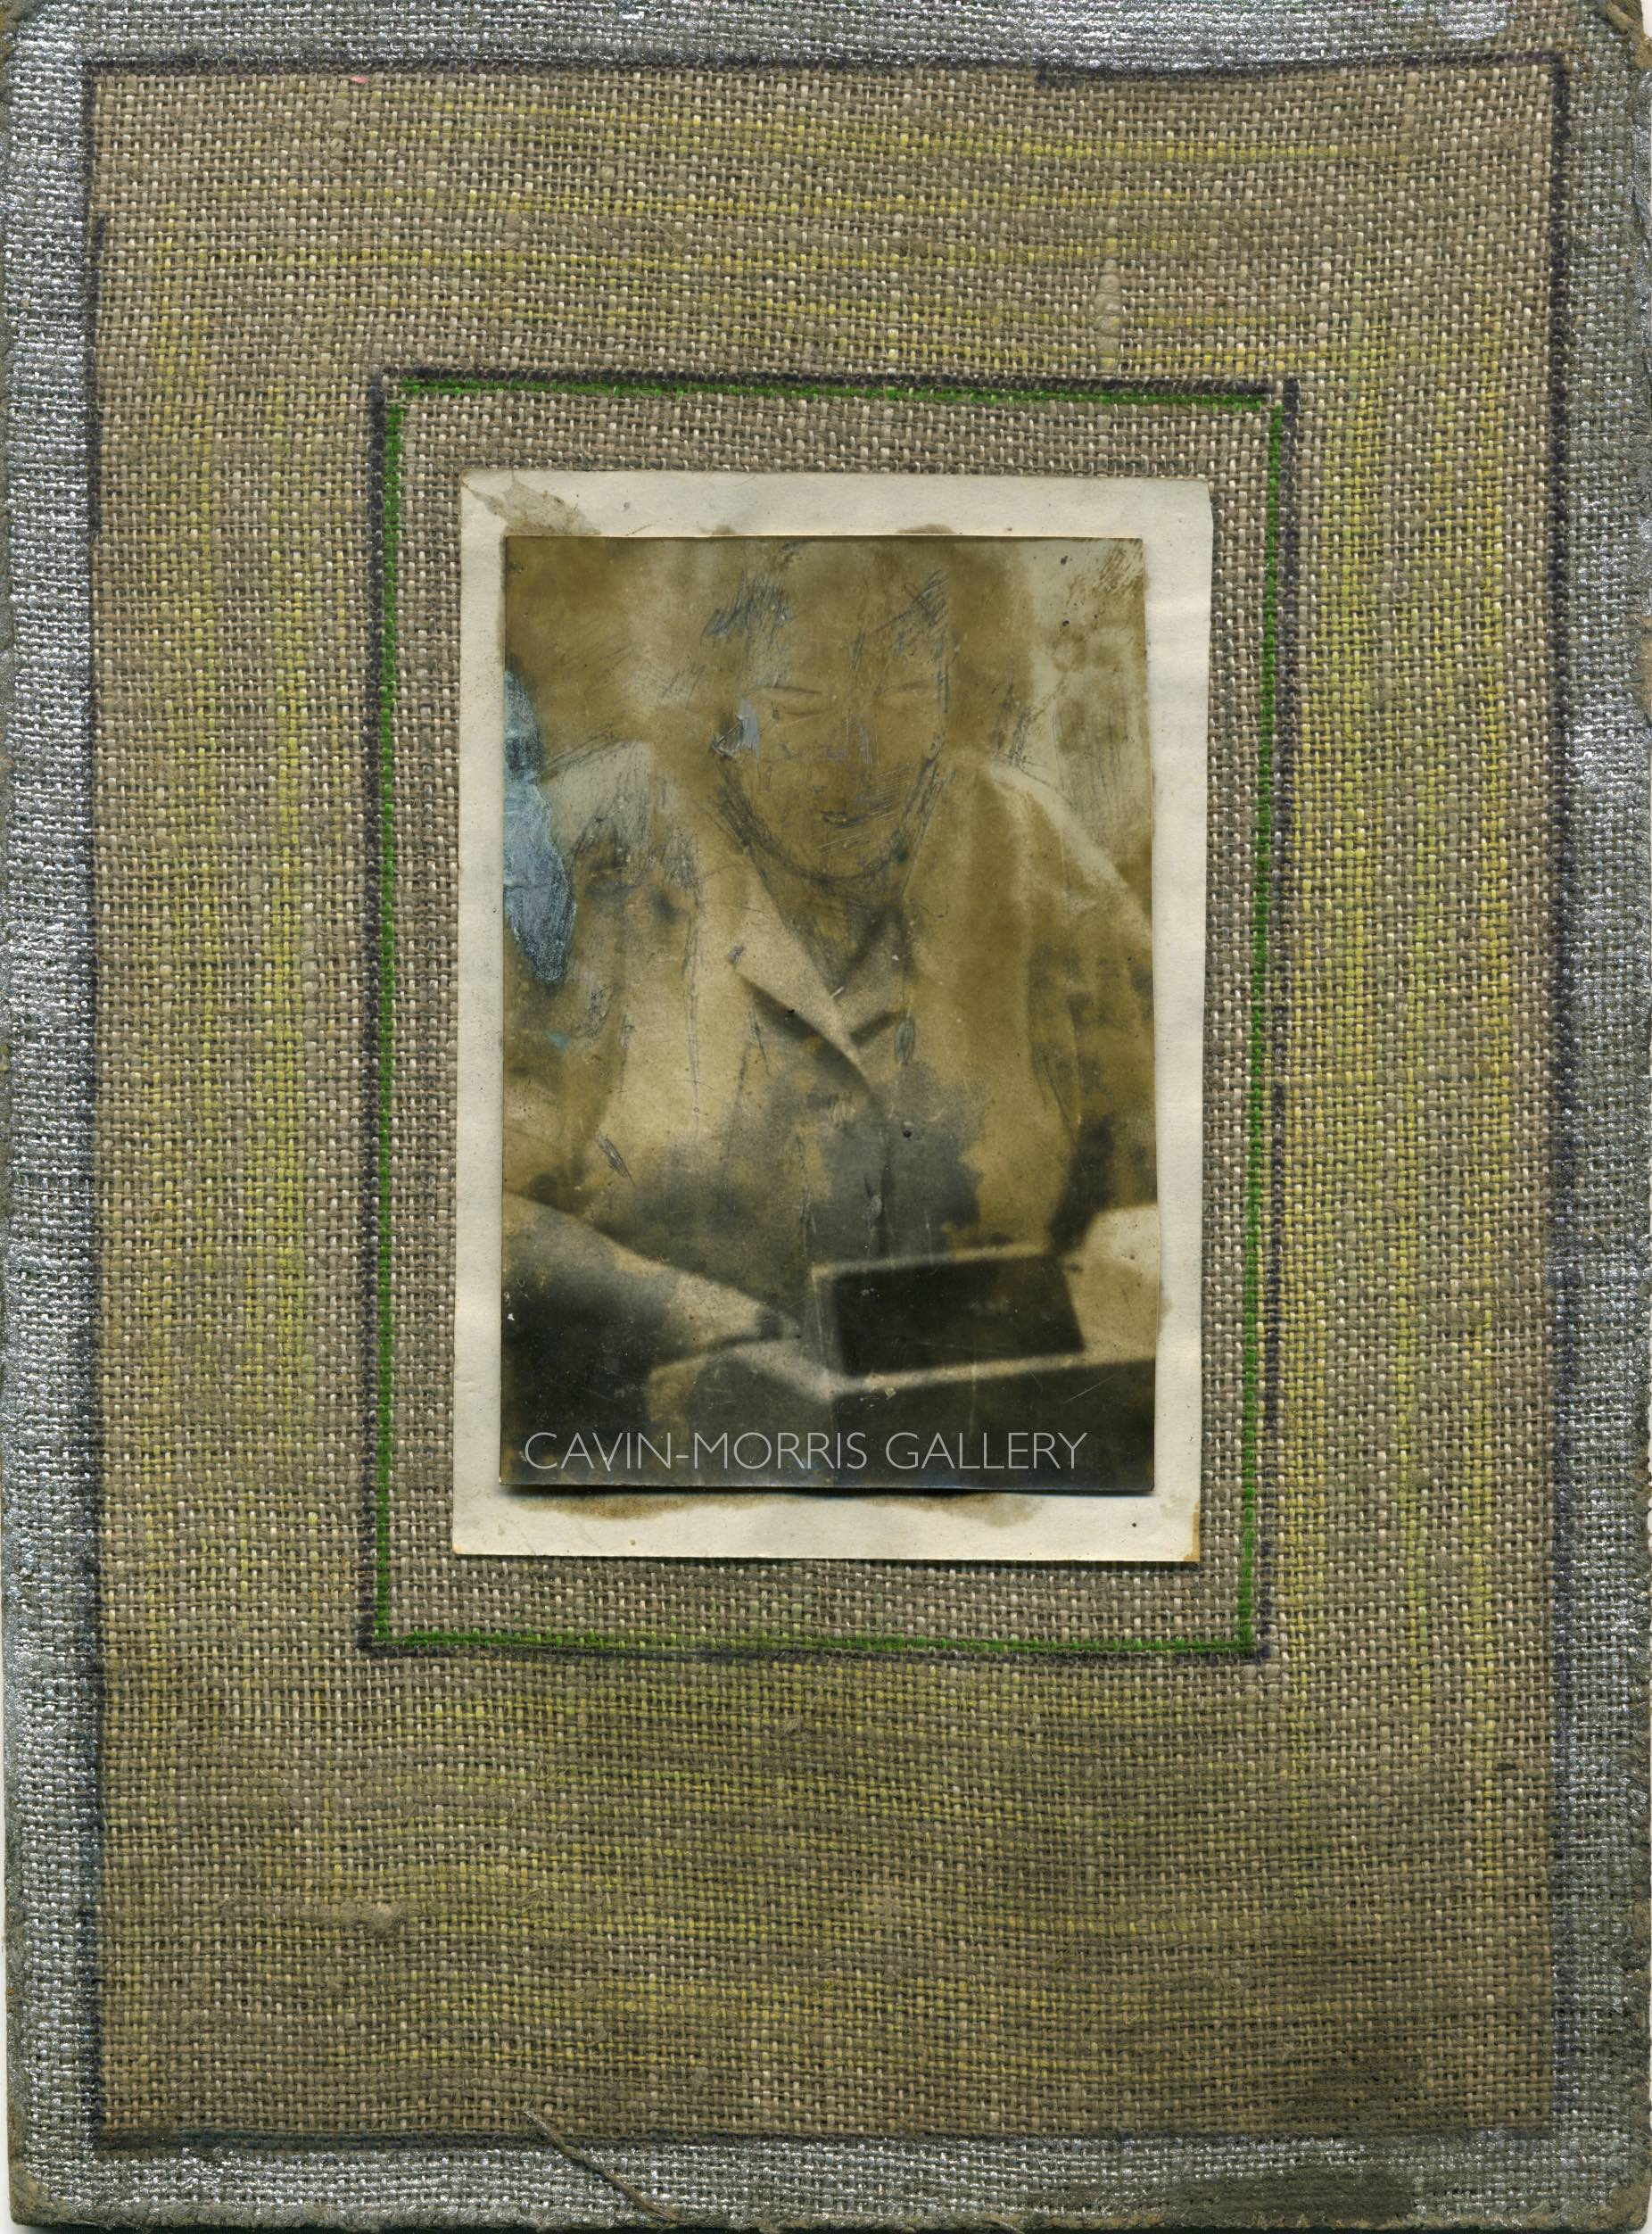 Miroslav Tichý    Untitled  , 1960s-1980s Gelatin silver print 8.66 x 6.3 inches 22 x 16 cm MTi 53